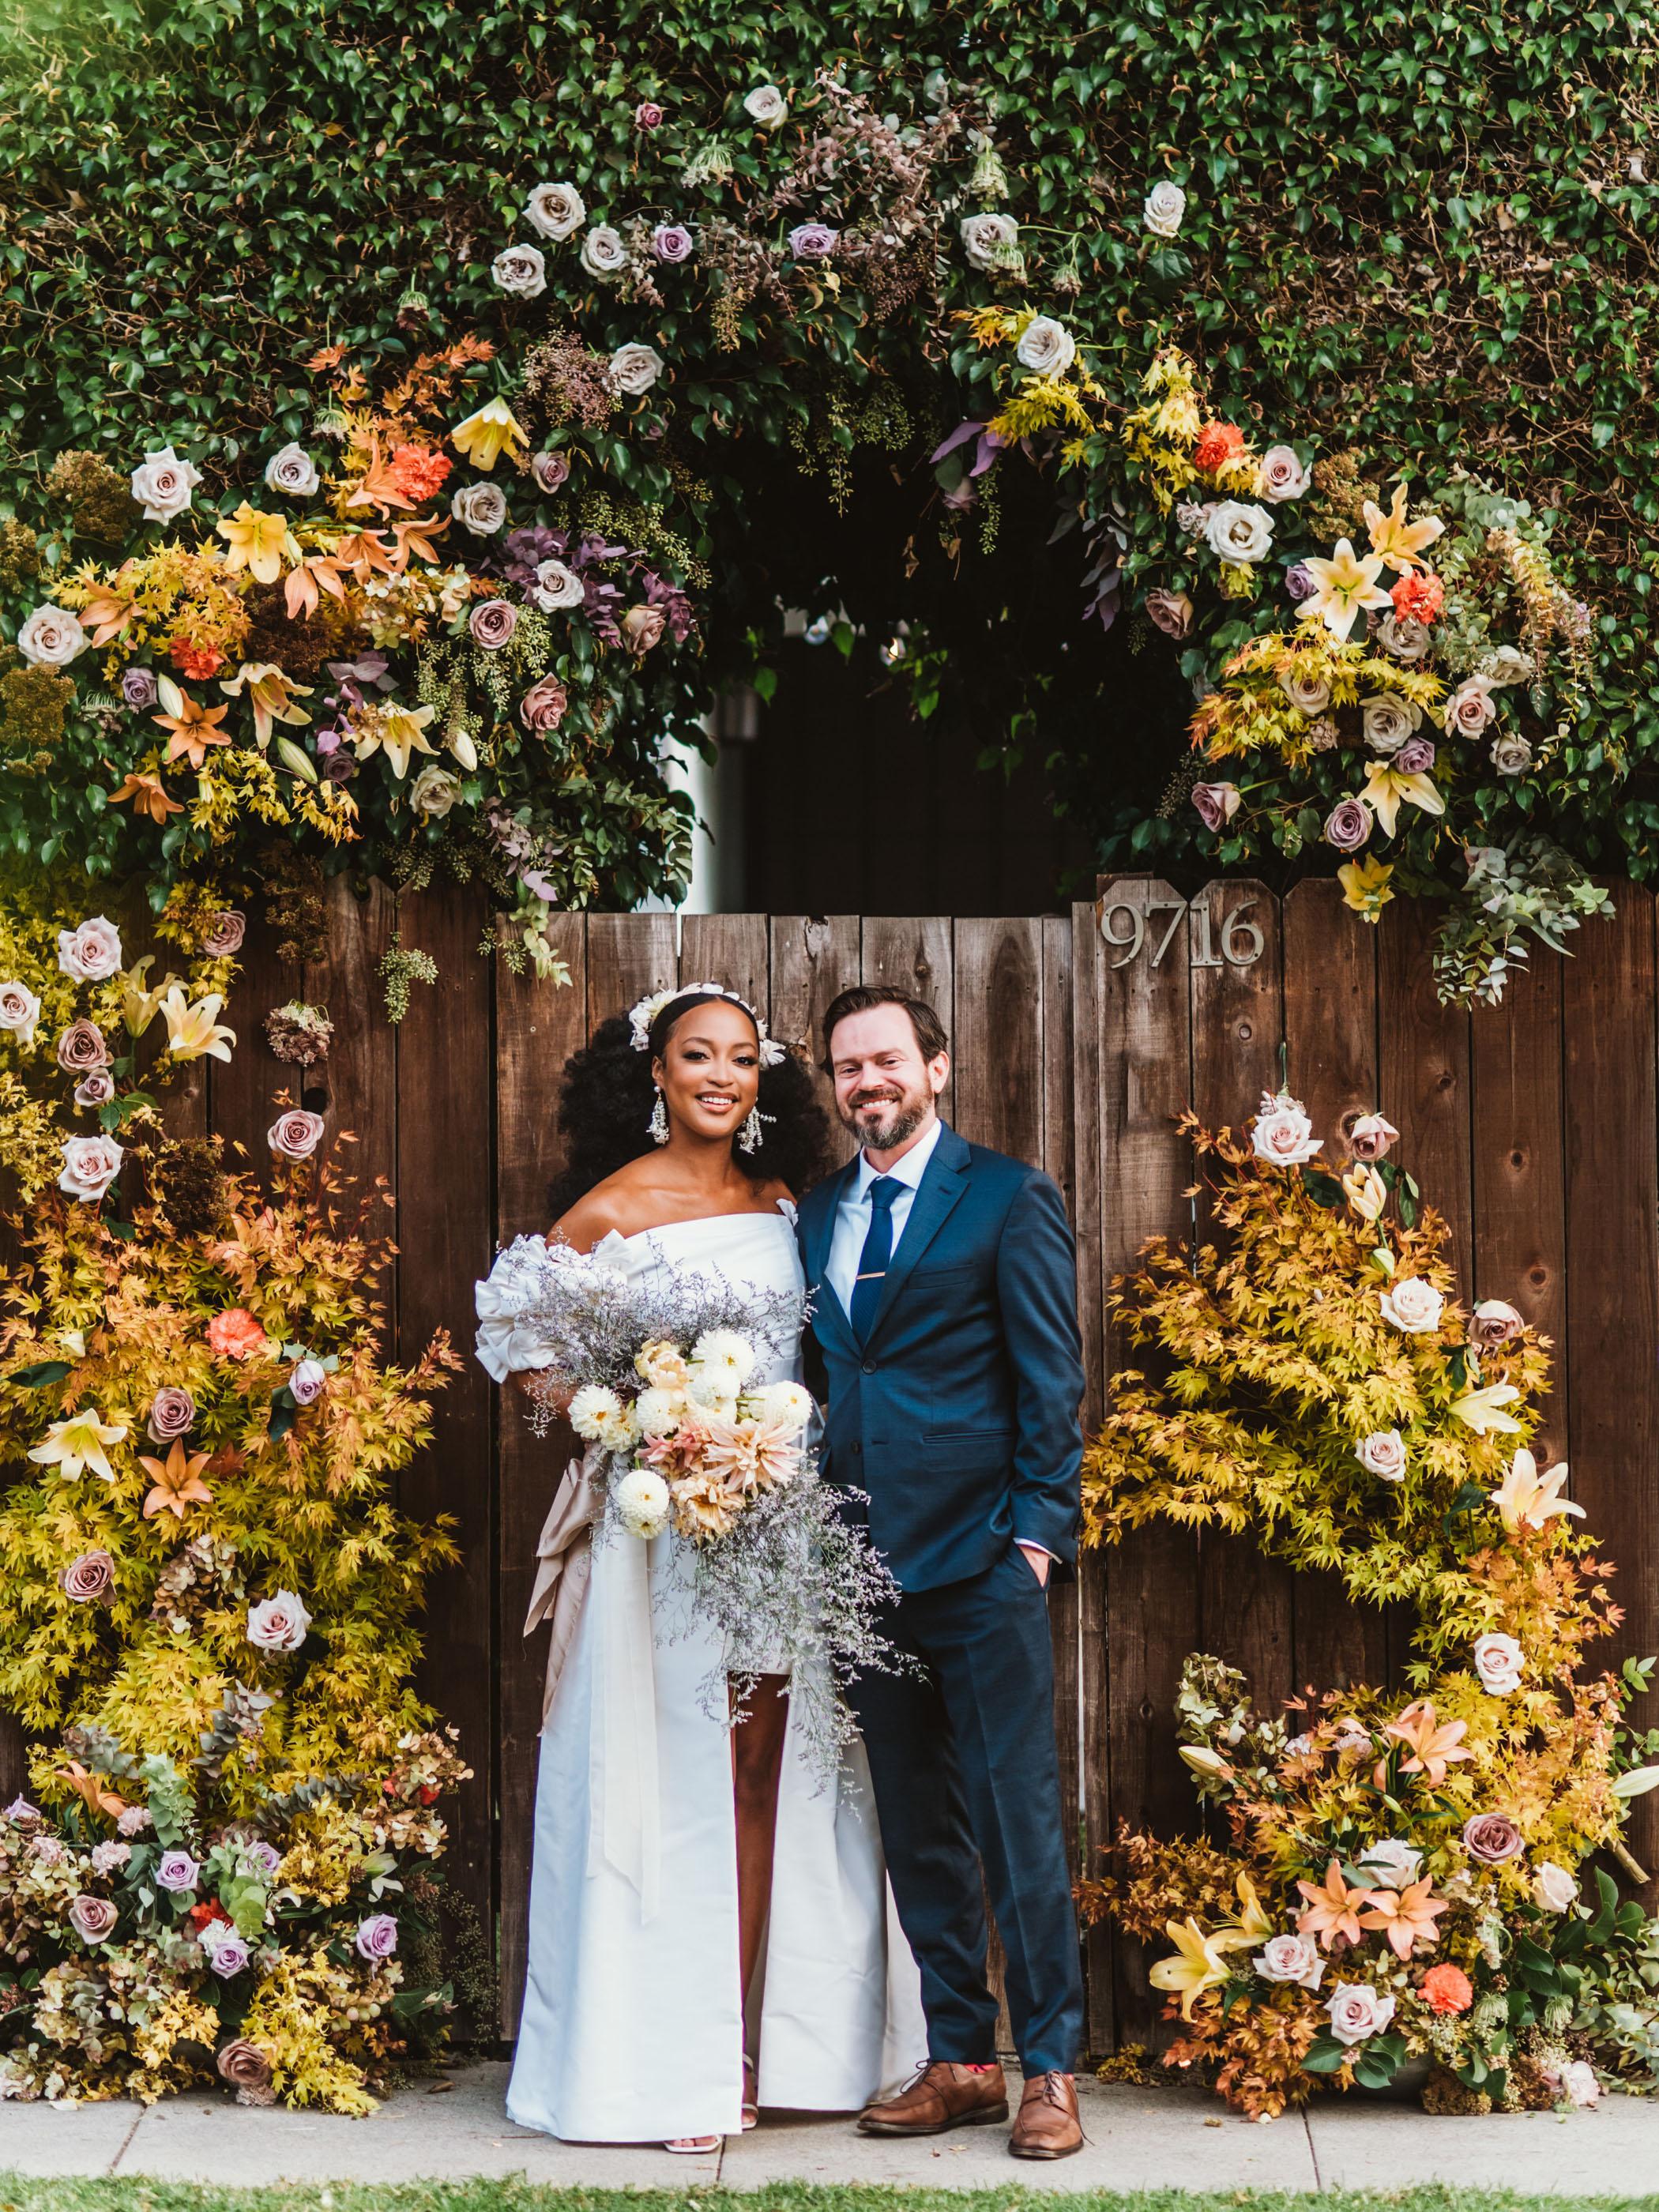 Colorful backyard garden wedding